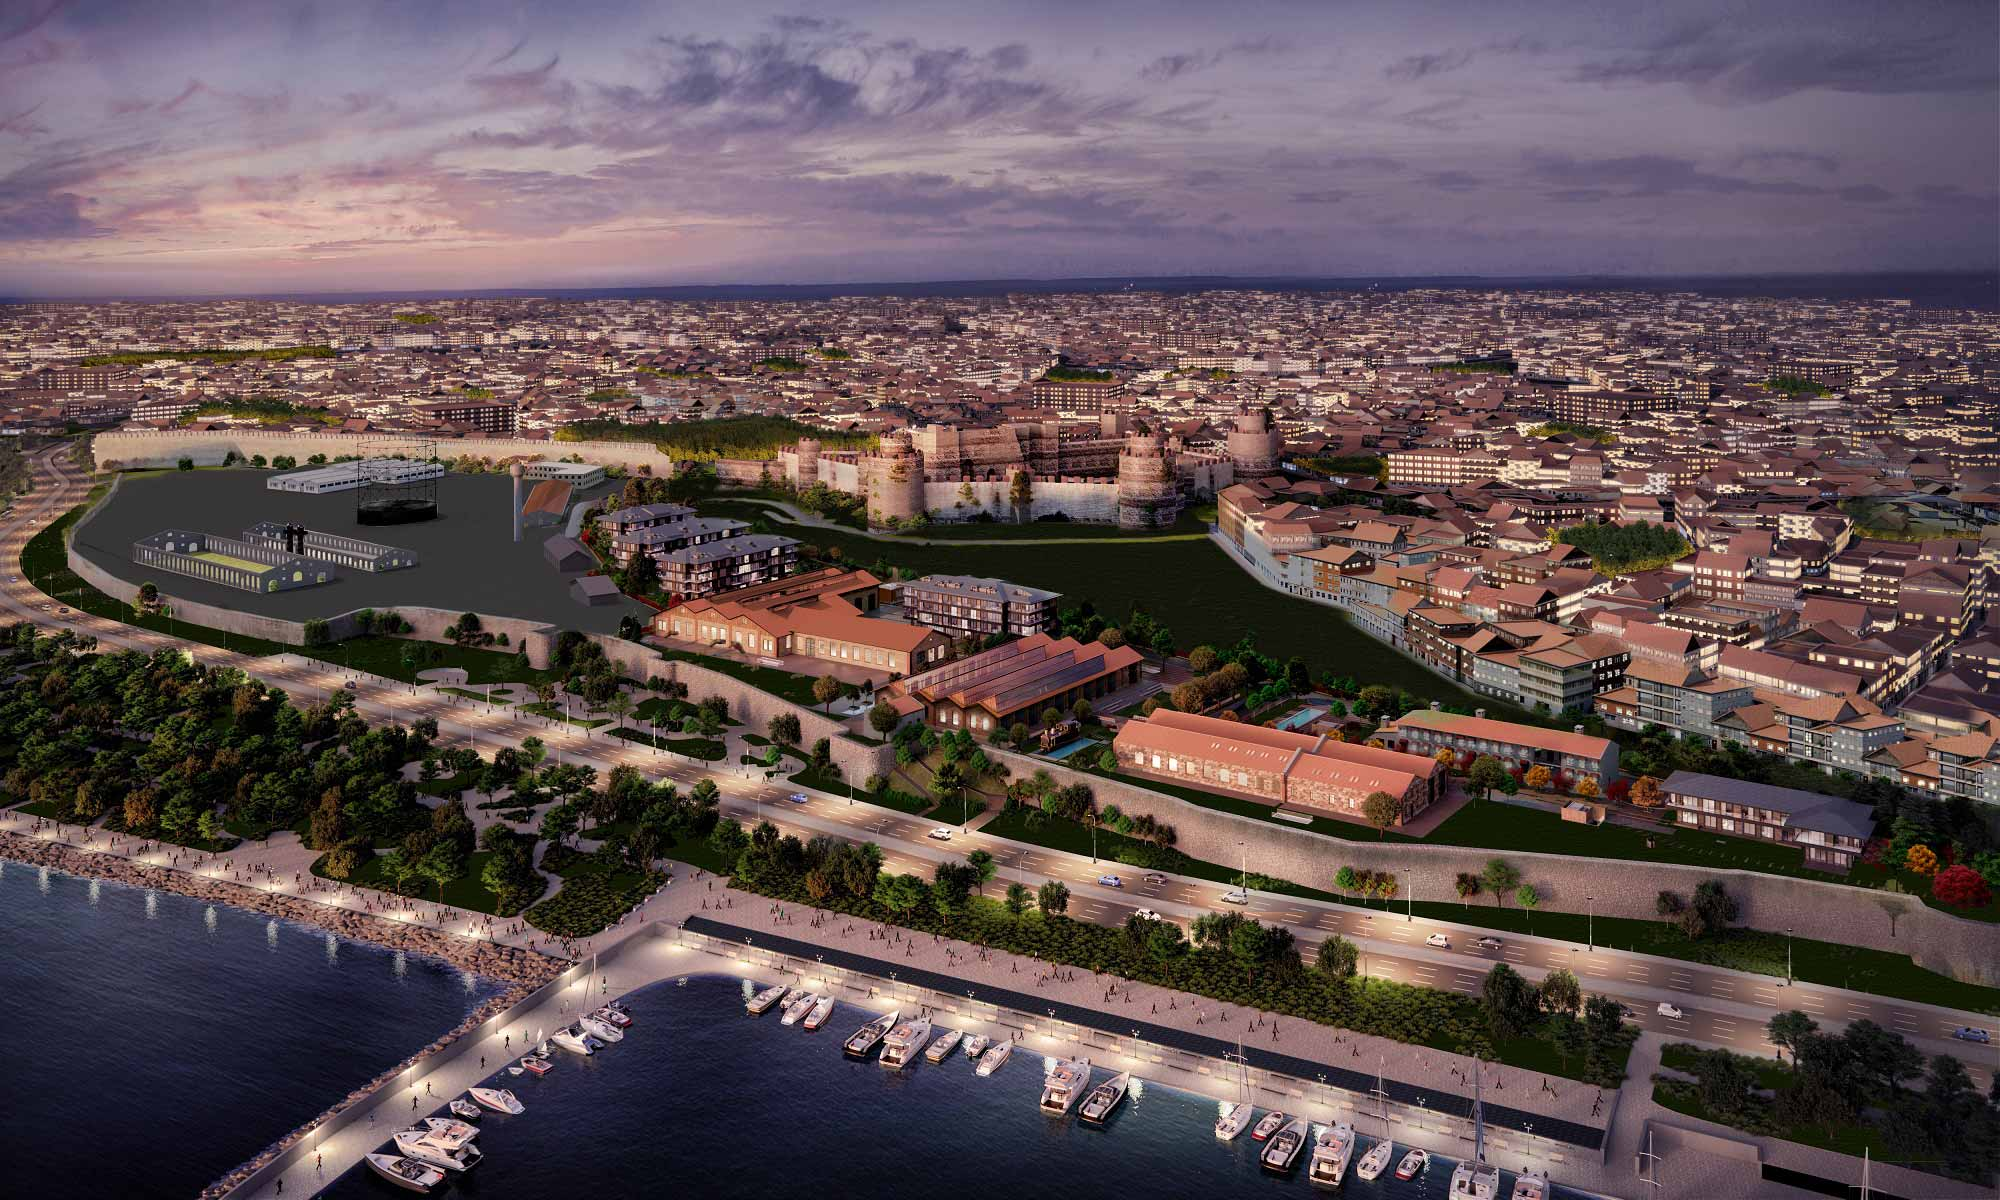 cer-istanbul-project-seaside-001-7.jpg